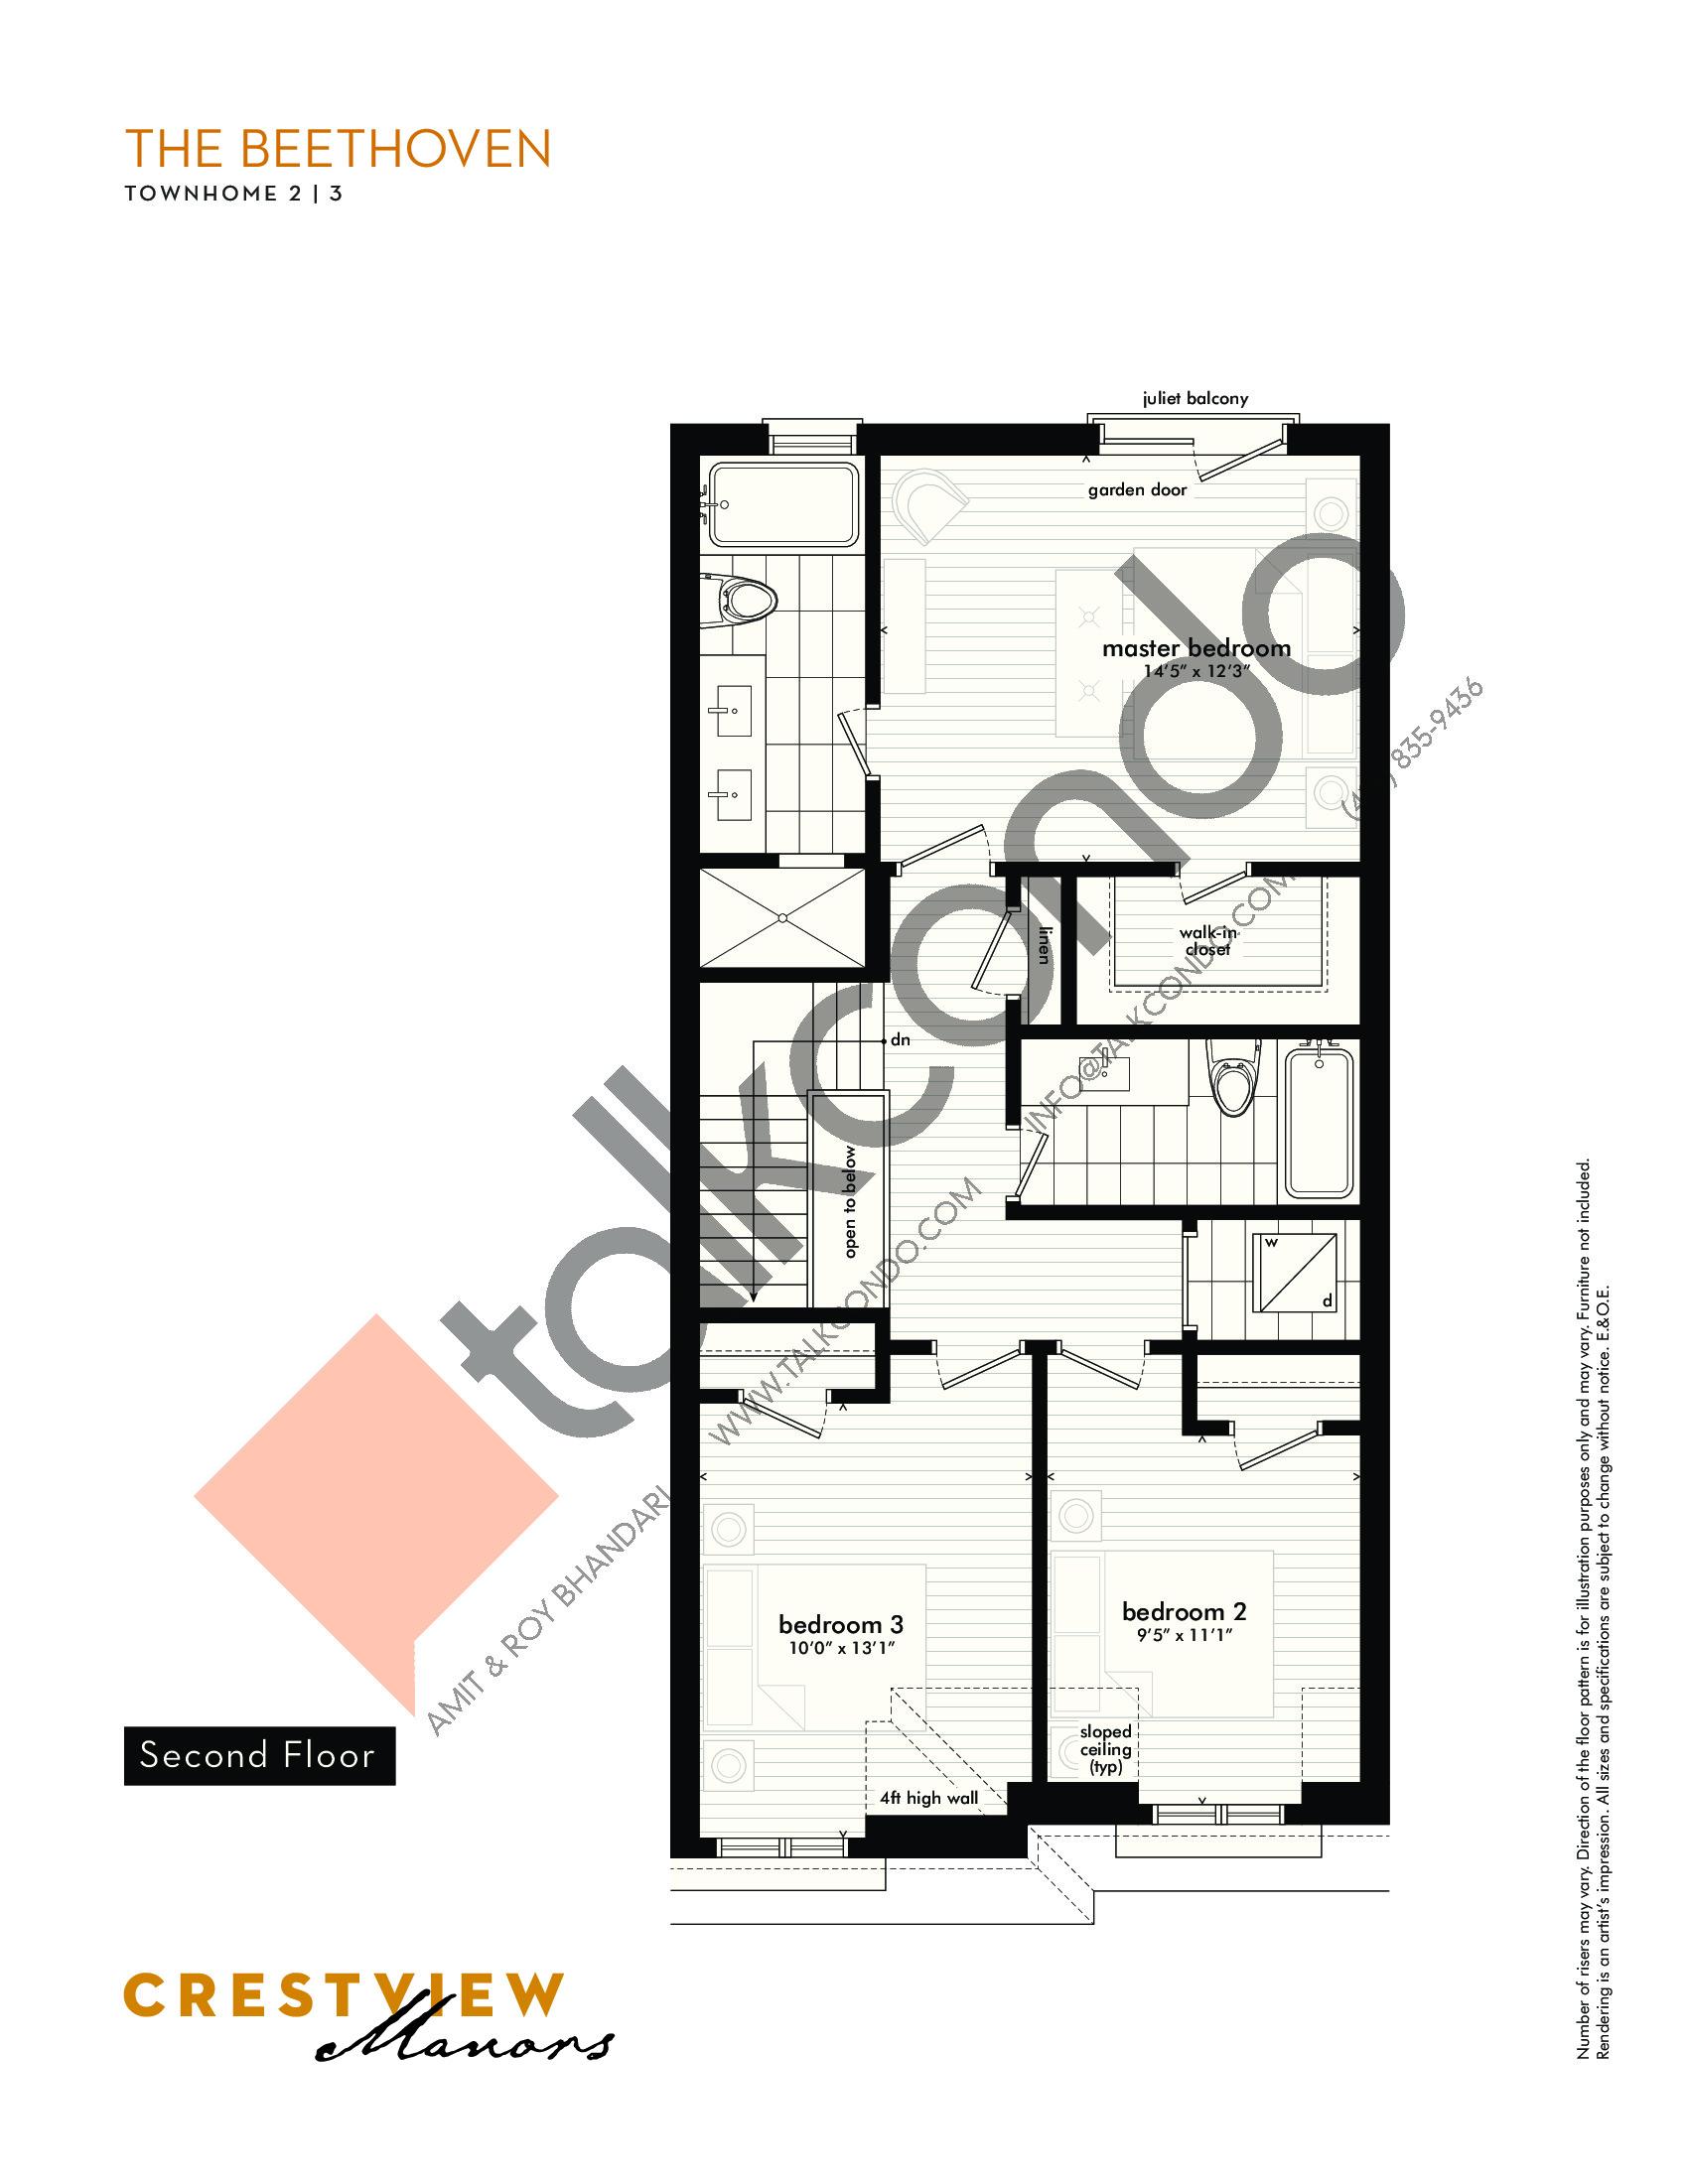 The Beethoven - Second Floor Floor Plan at Crestview Manors - 2362 sq.ft